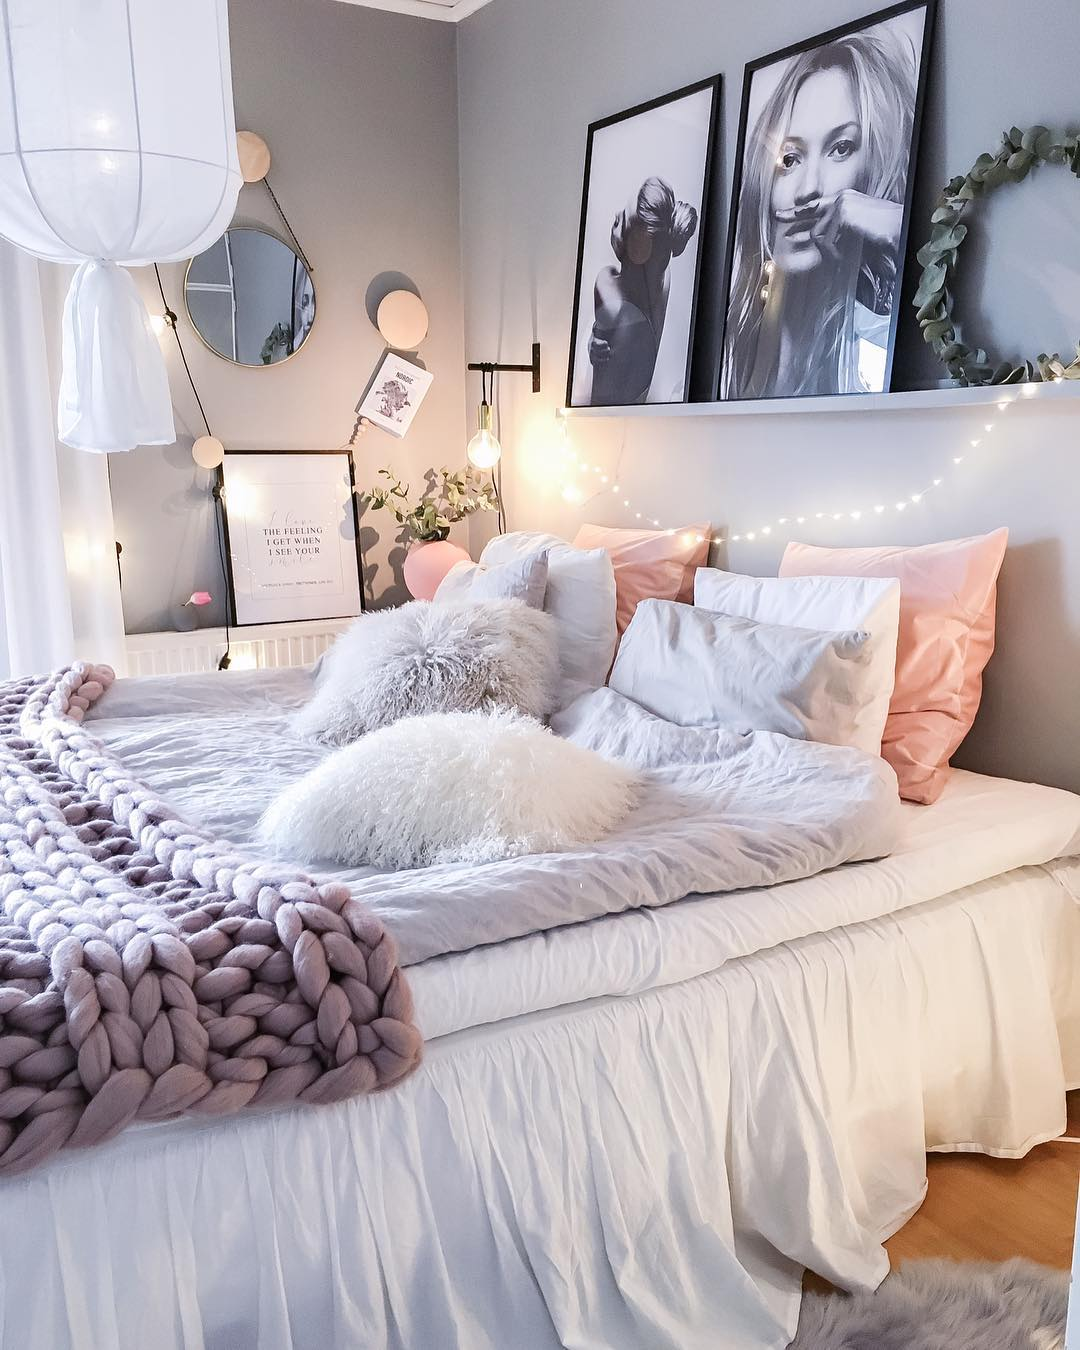 21 Bohemian Chic Bedroom Decor Ideas